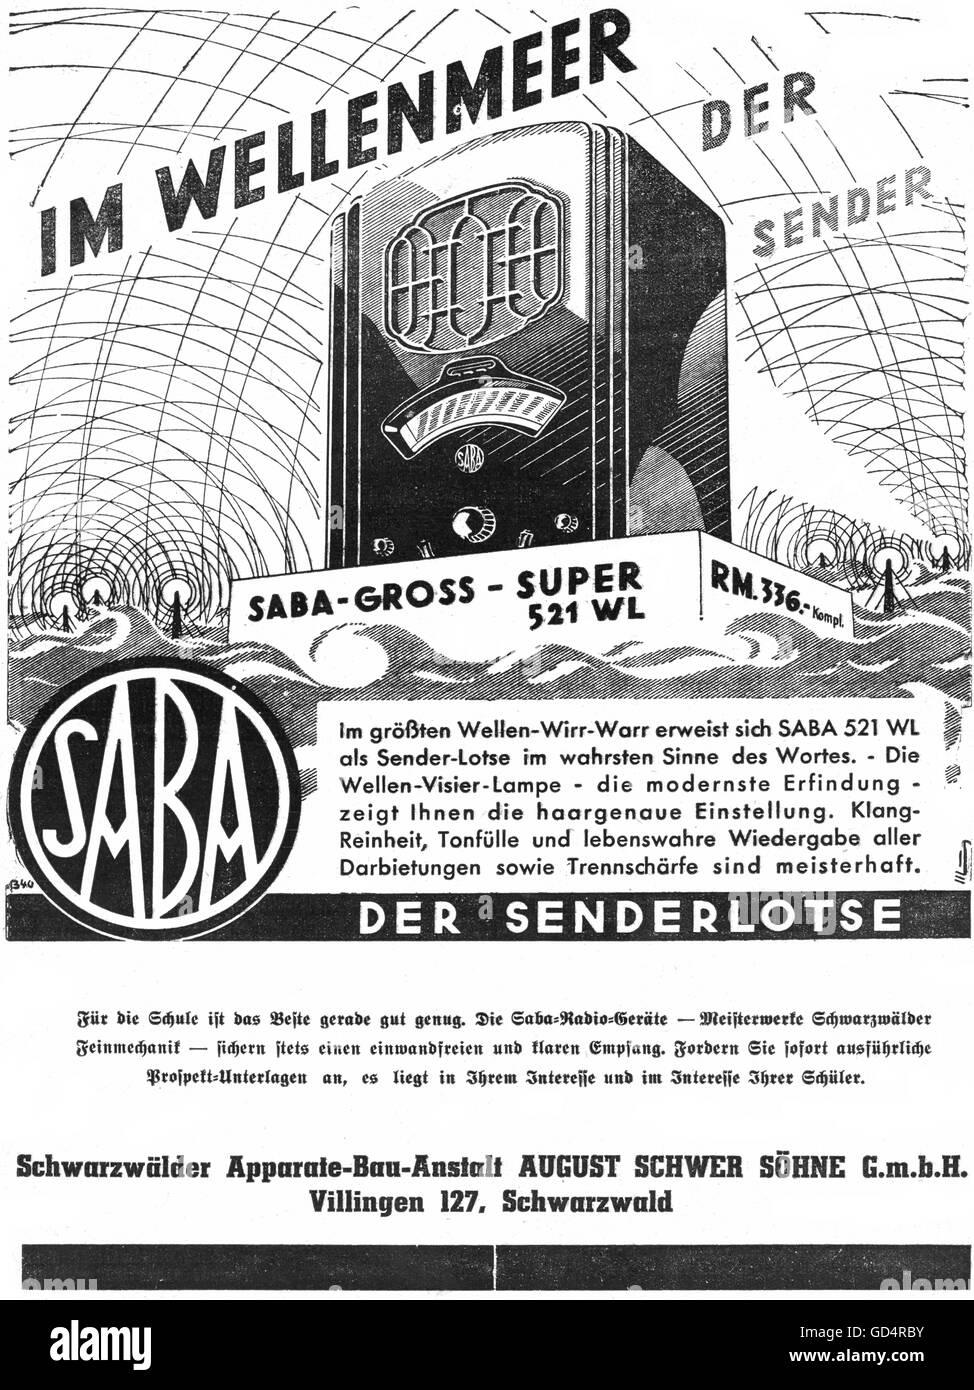 advertising, radio, Saba 521 WL, Schwarzwälder-Apparate-Bau-Anstalt, August Schwer sons private limited corporation, - Stock Image